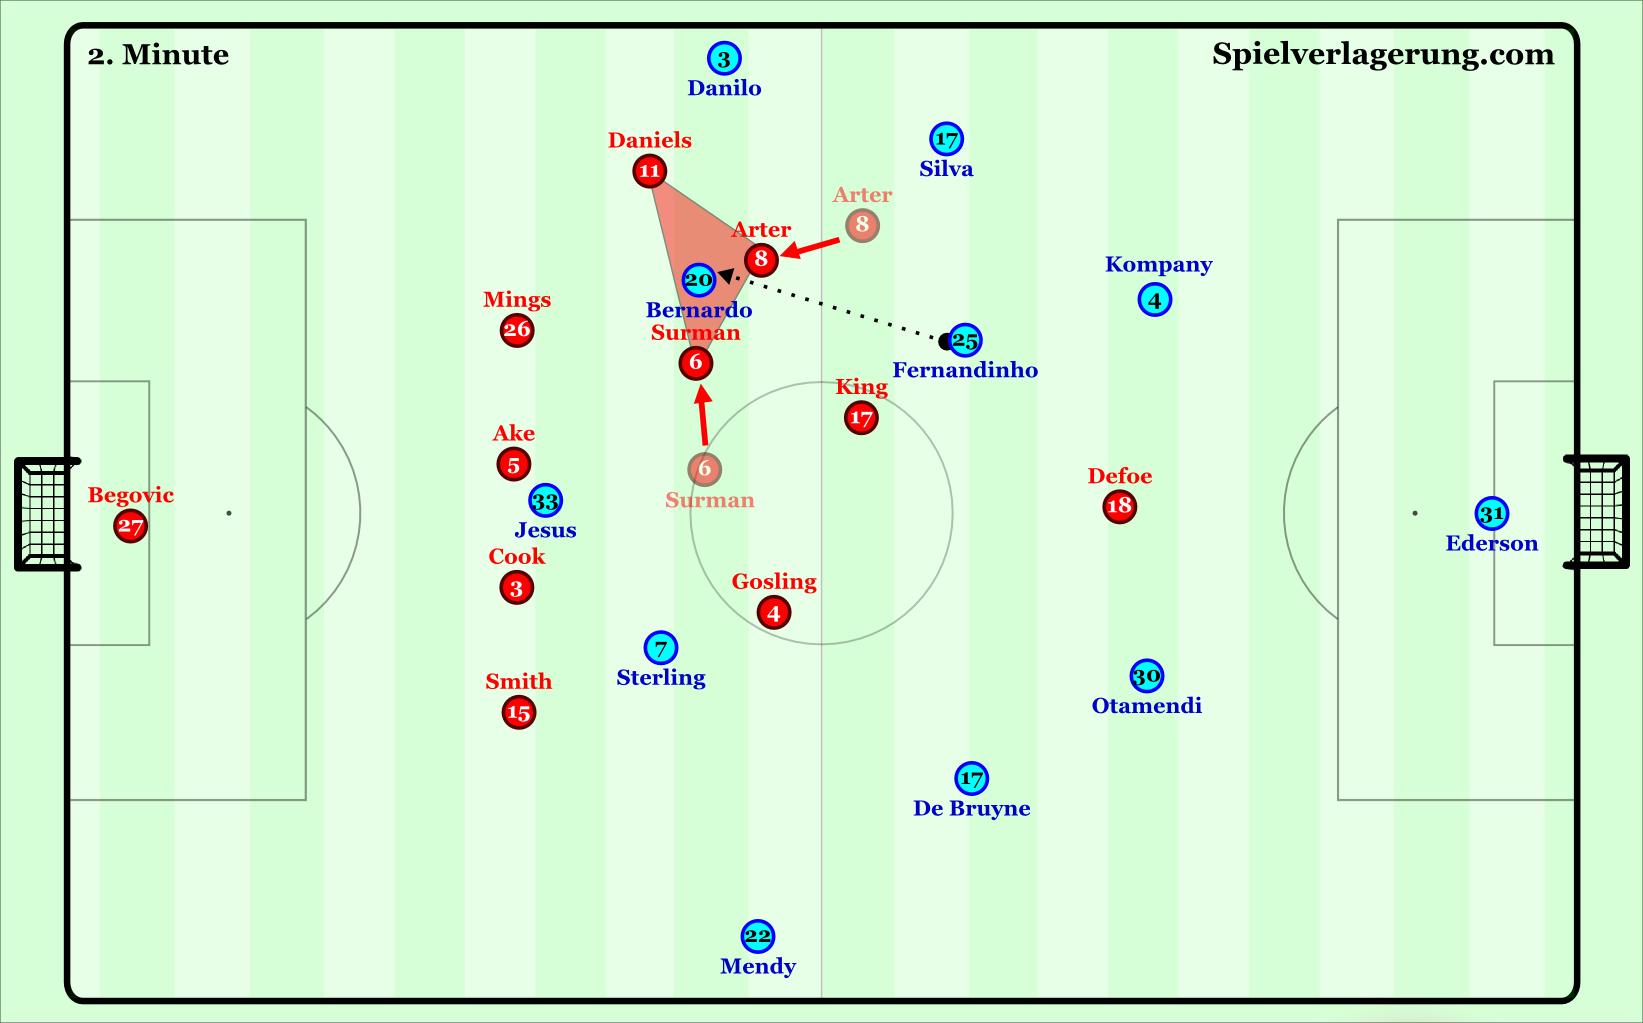 AFCB pressing triangle